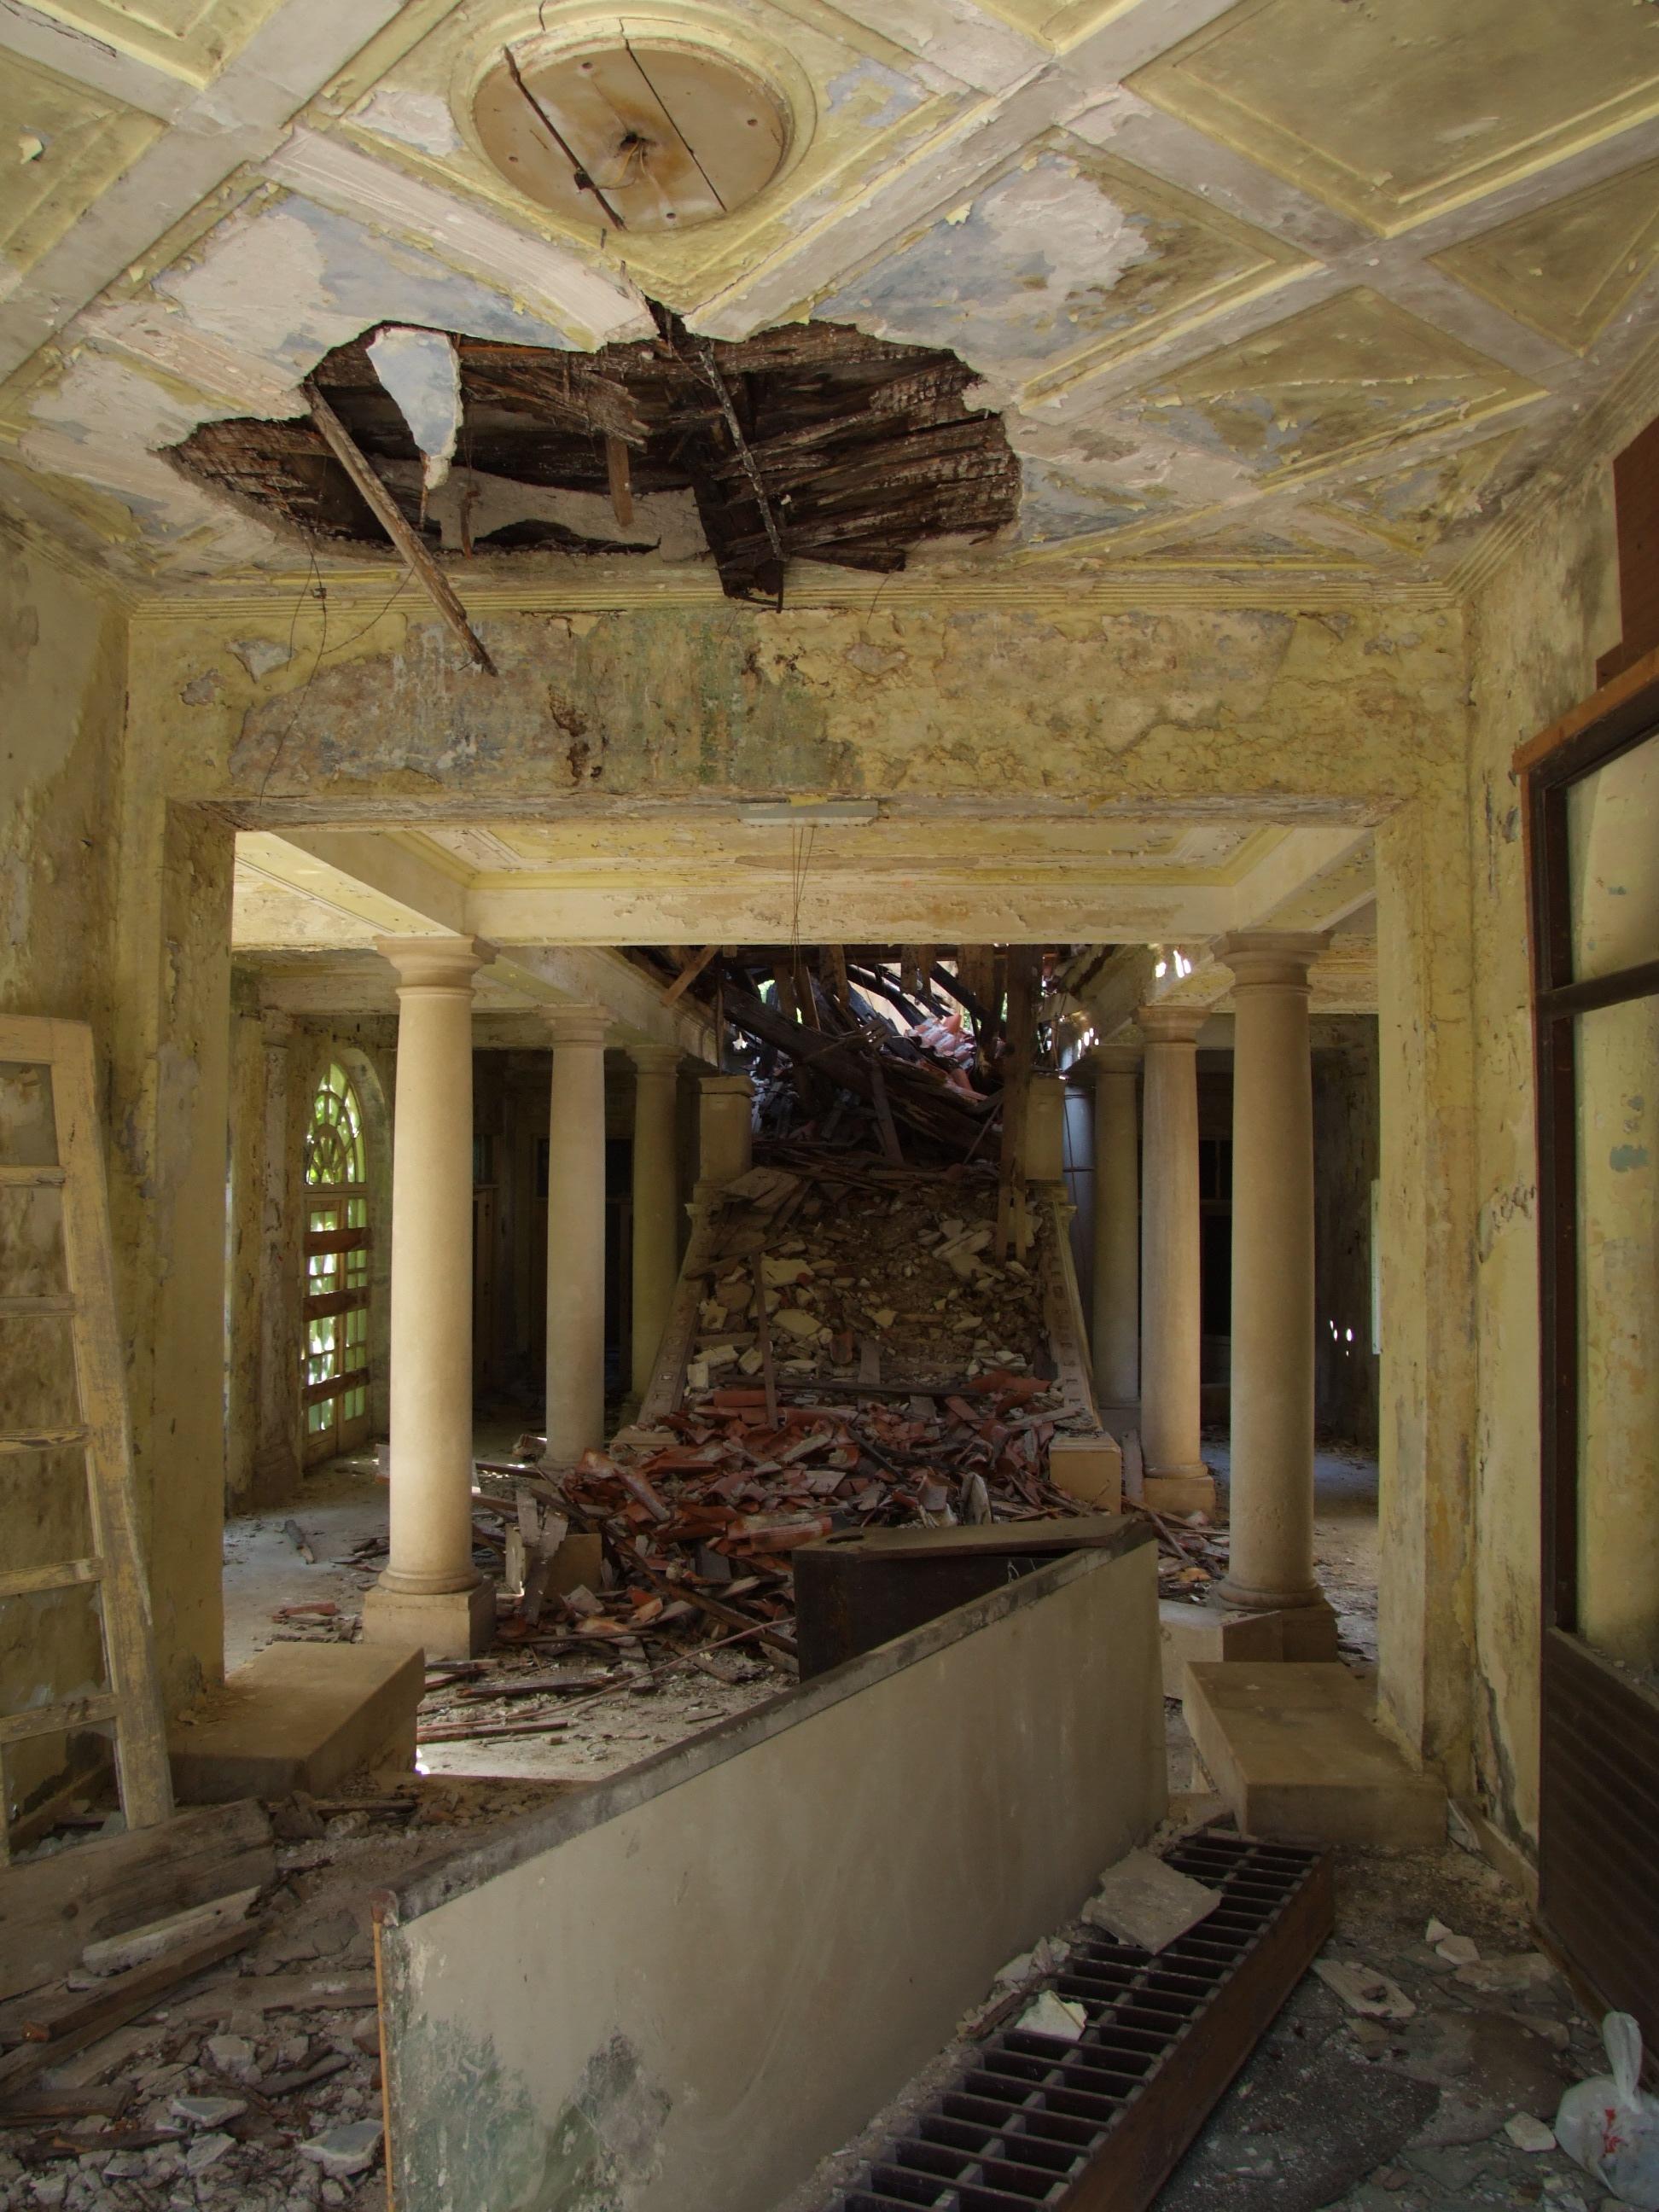 FileHotel Grand  destroyed hotel in Kupari CroatiaJPG